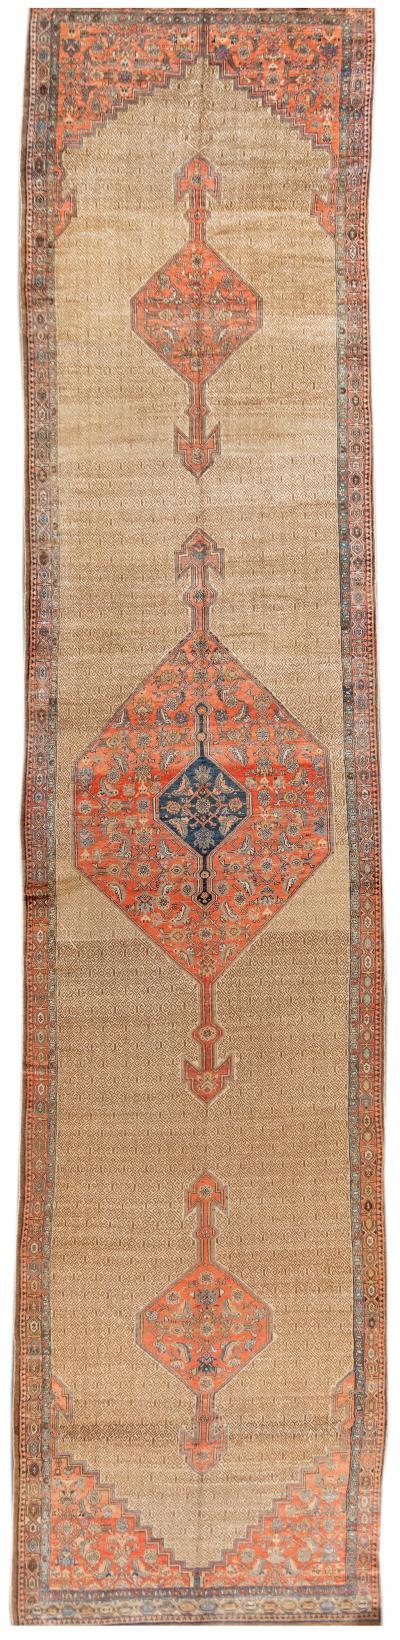 Early 20th Century Antique Hamadan Wool Rug 6 x 26